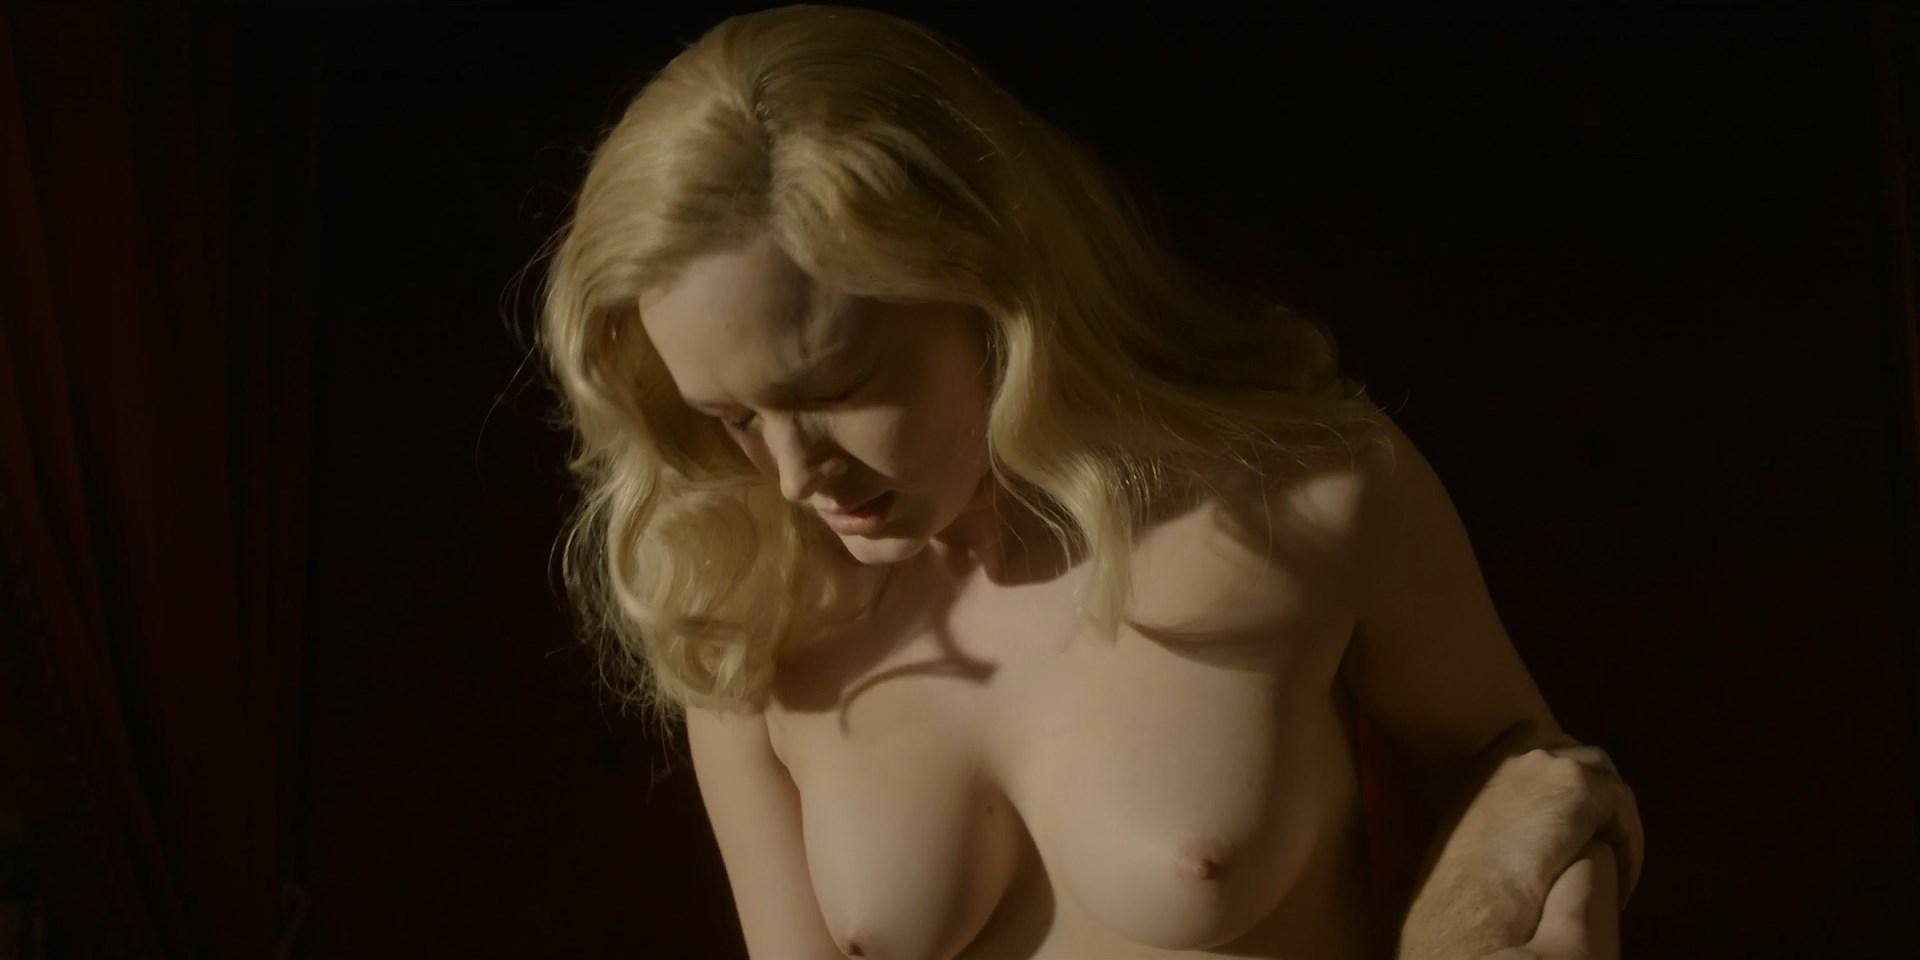 Angie Cepeda Scene bella heathcote nude - strange angel s02e01 (2019) video